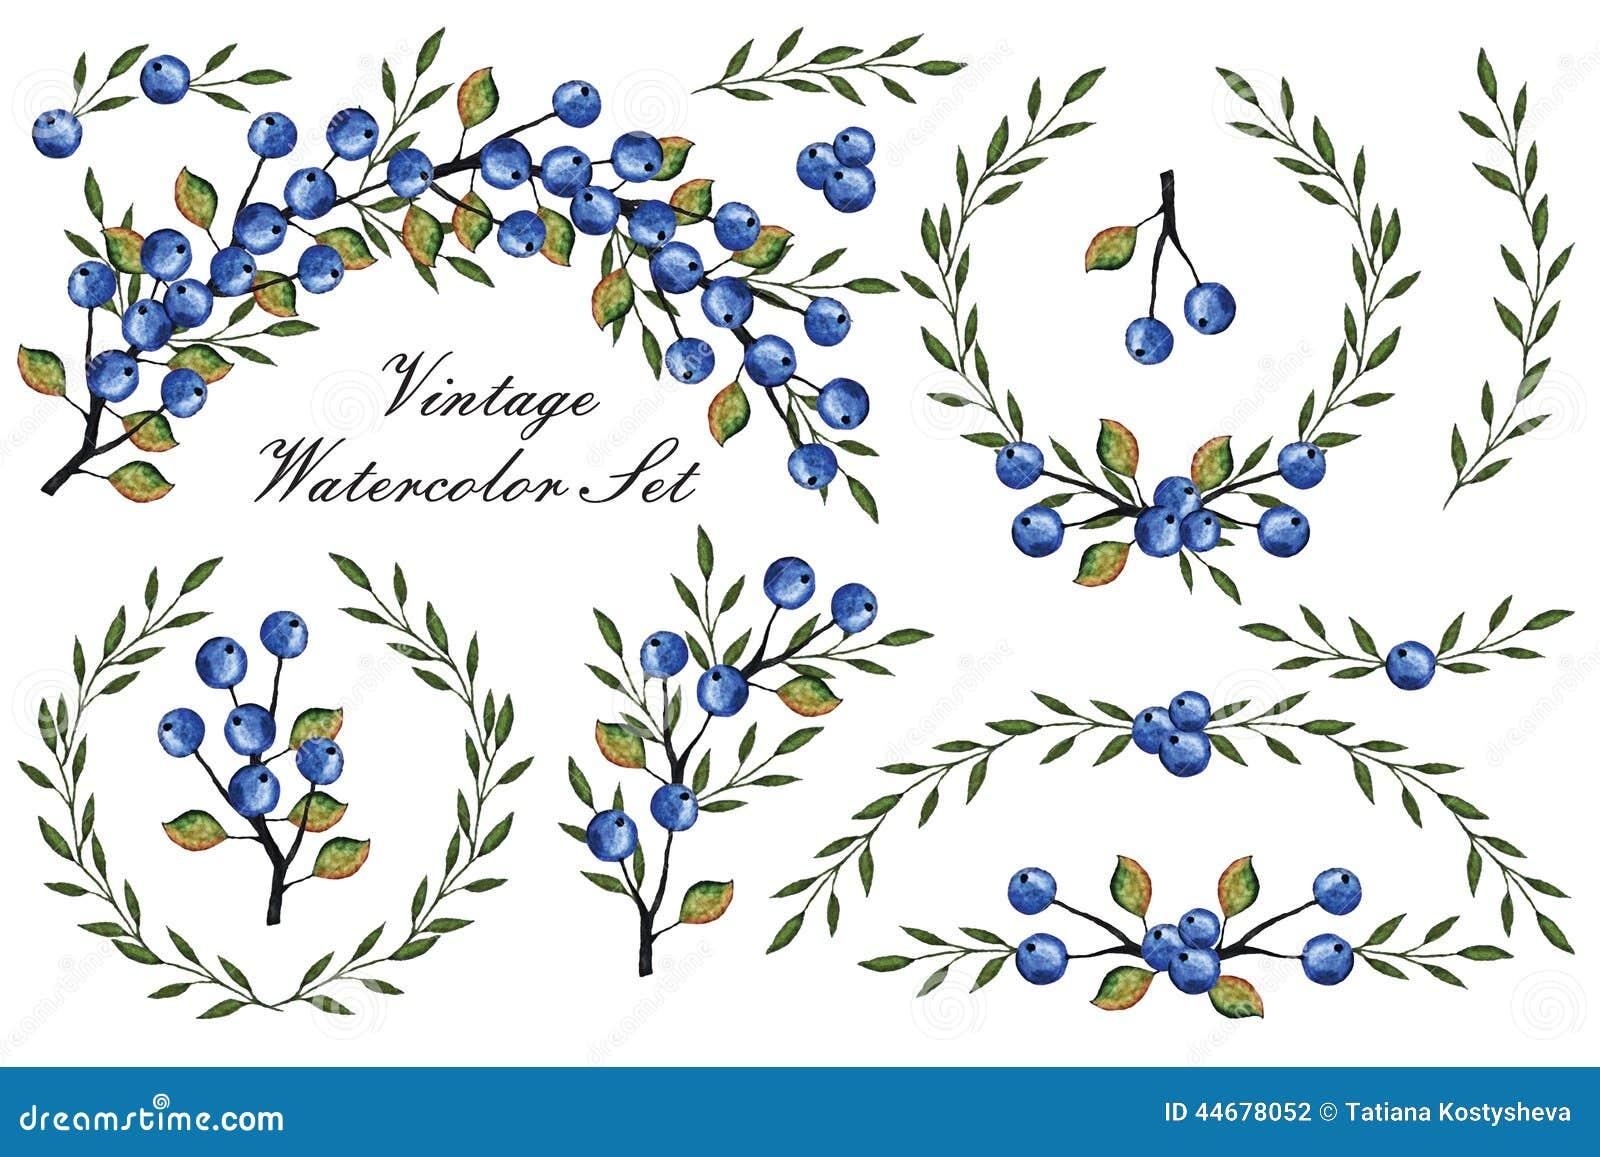 Wedding Celebration Invitations with adorable invitation template